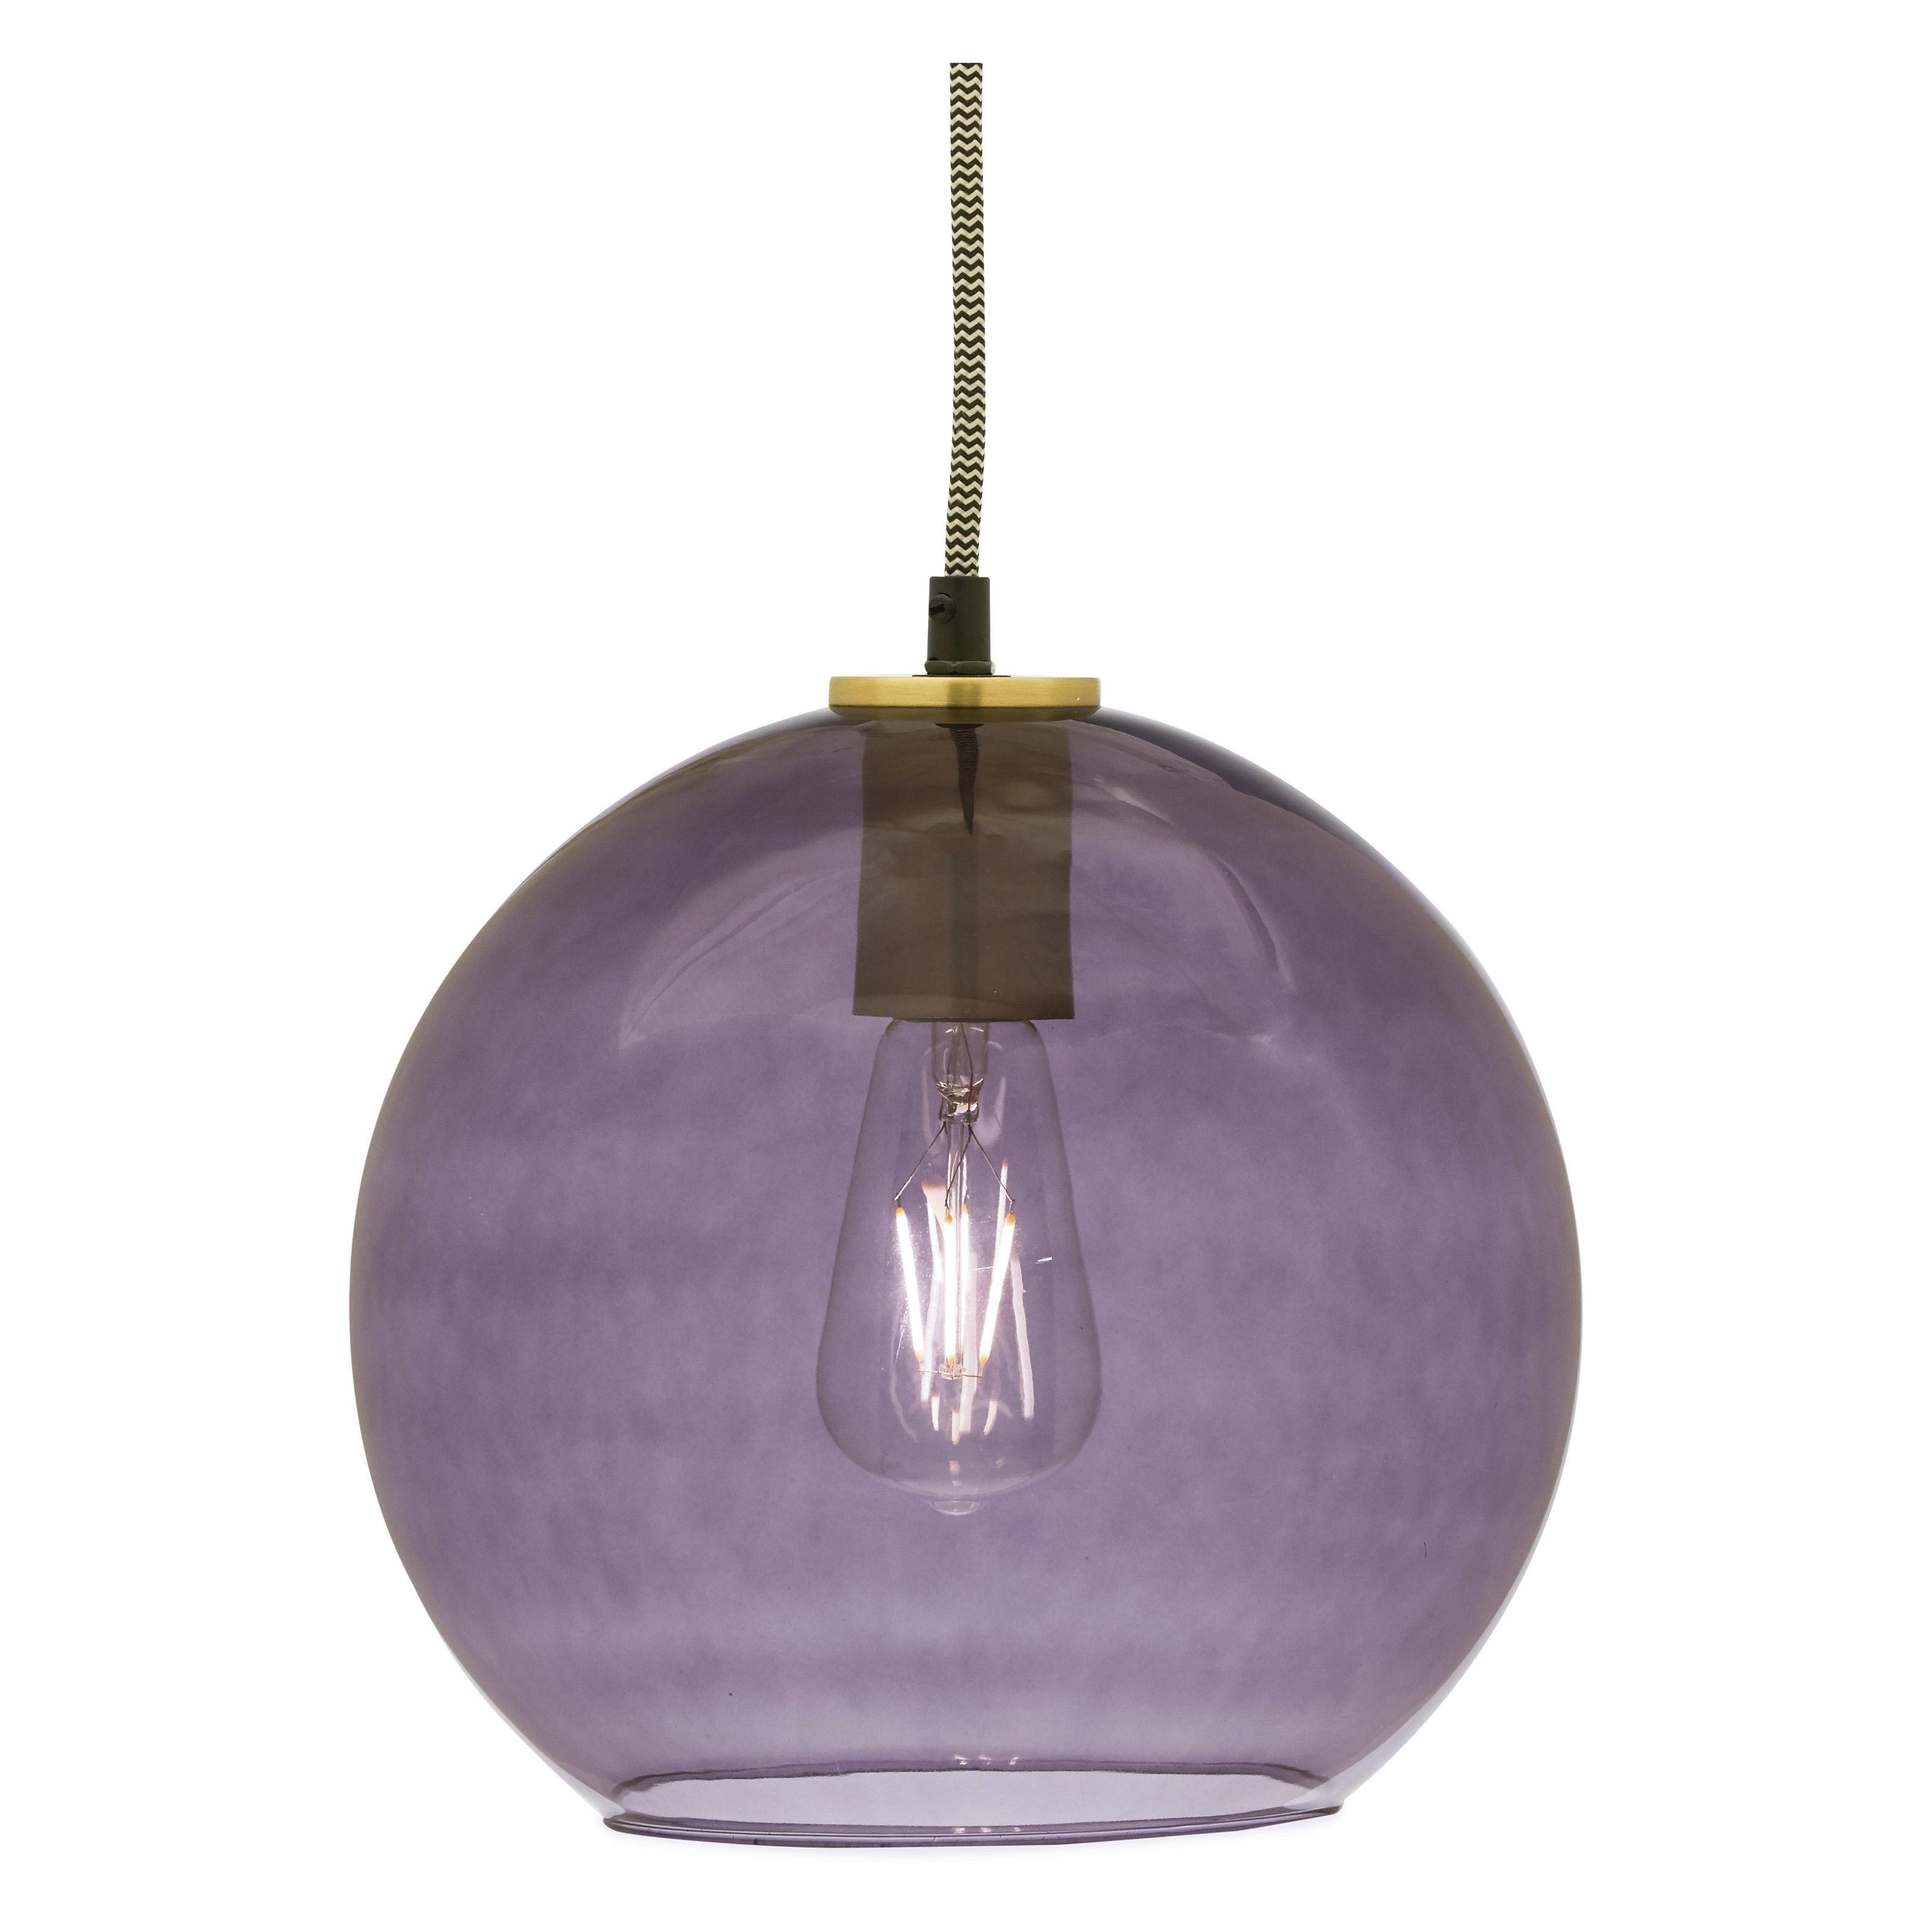 Best and Newest Lighting & Lighting Fixtures - Walmart throughout Dailey 4-Light Drum Chandeliers